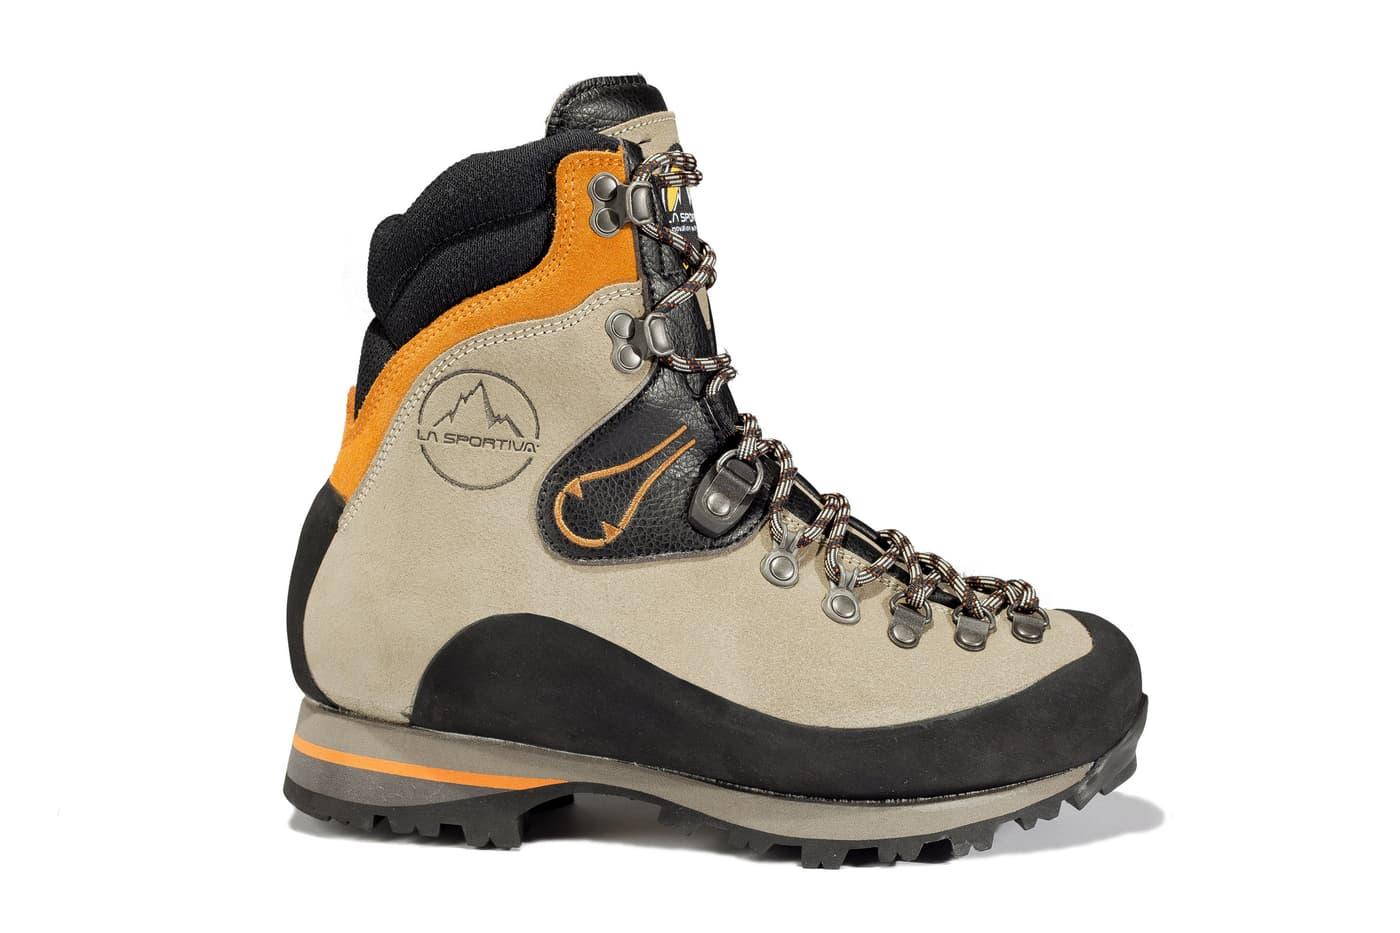 La Sportiva Karakorum Trek GTX Scarponcino da trekking donna ... 55b5be78c3a